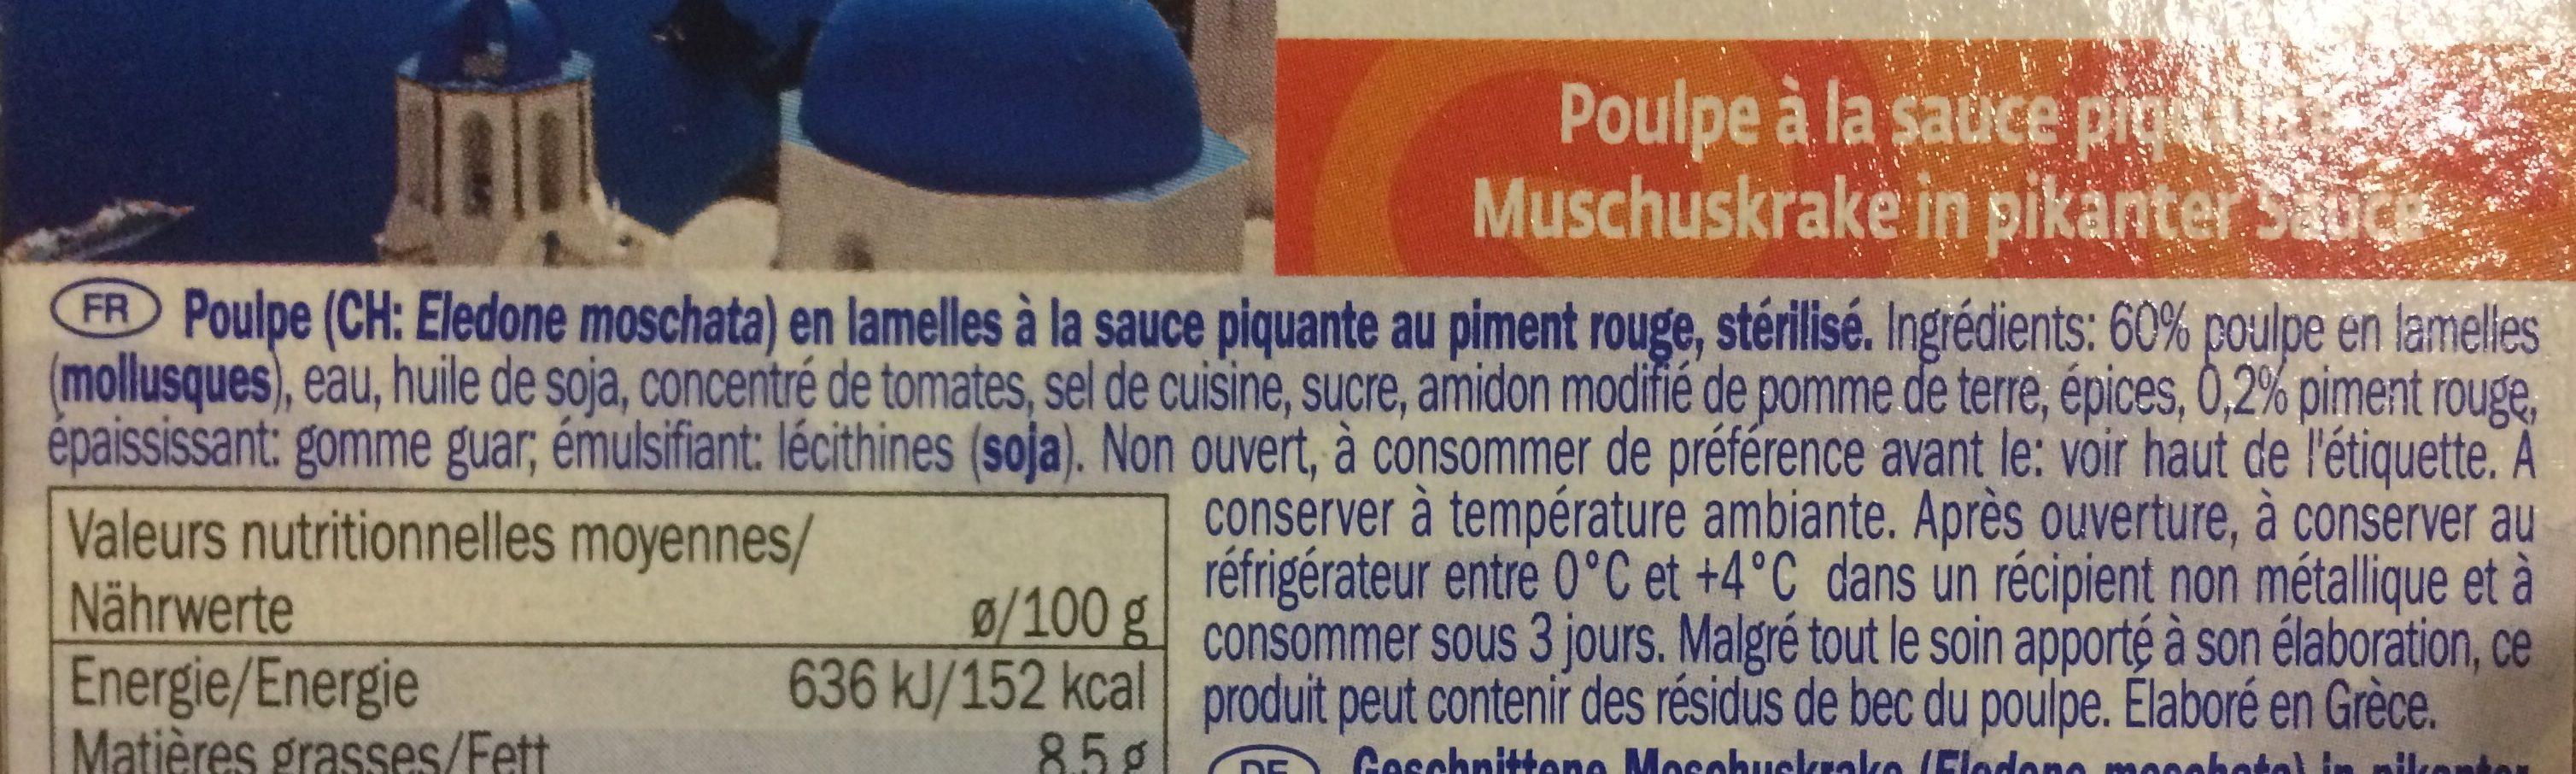 Poulpe a la sauce piquante - Ingredients - fr